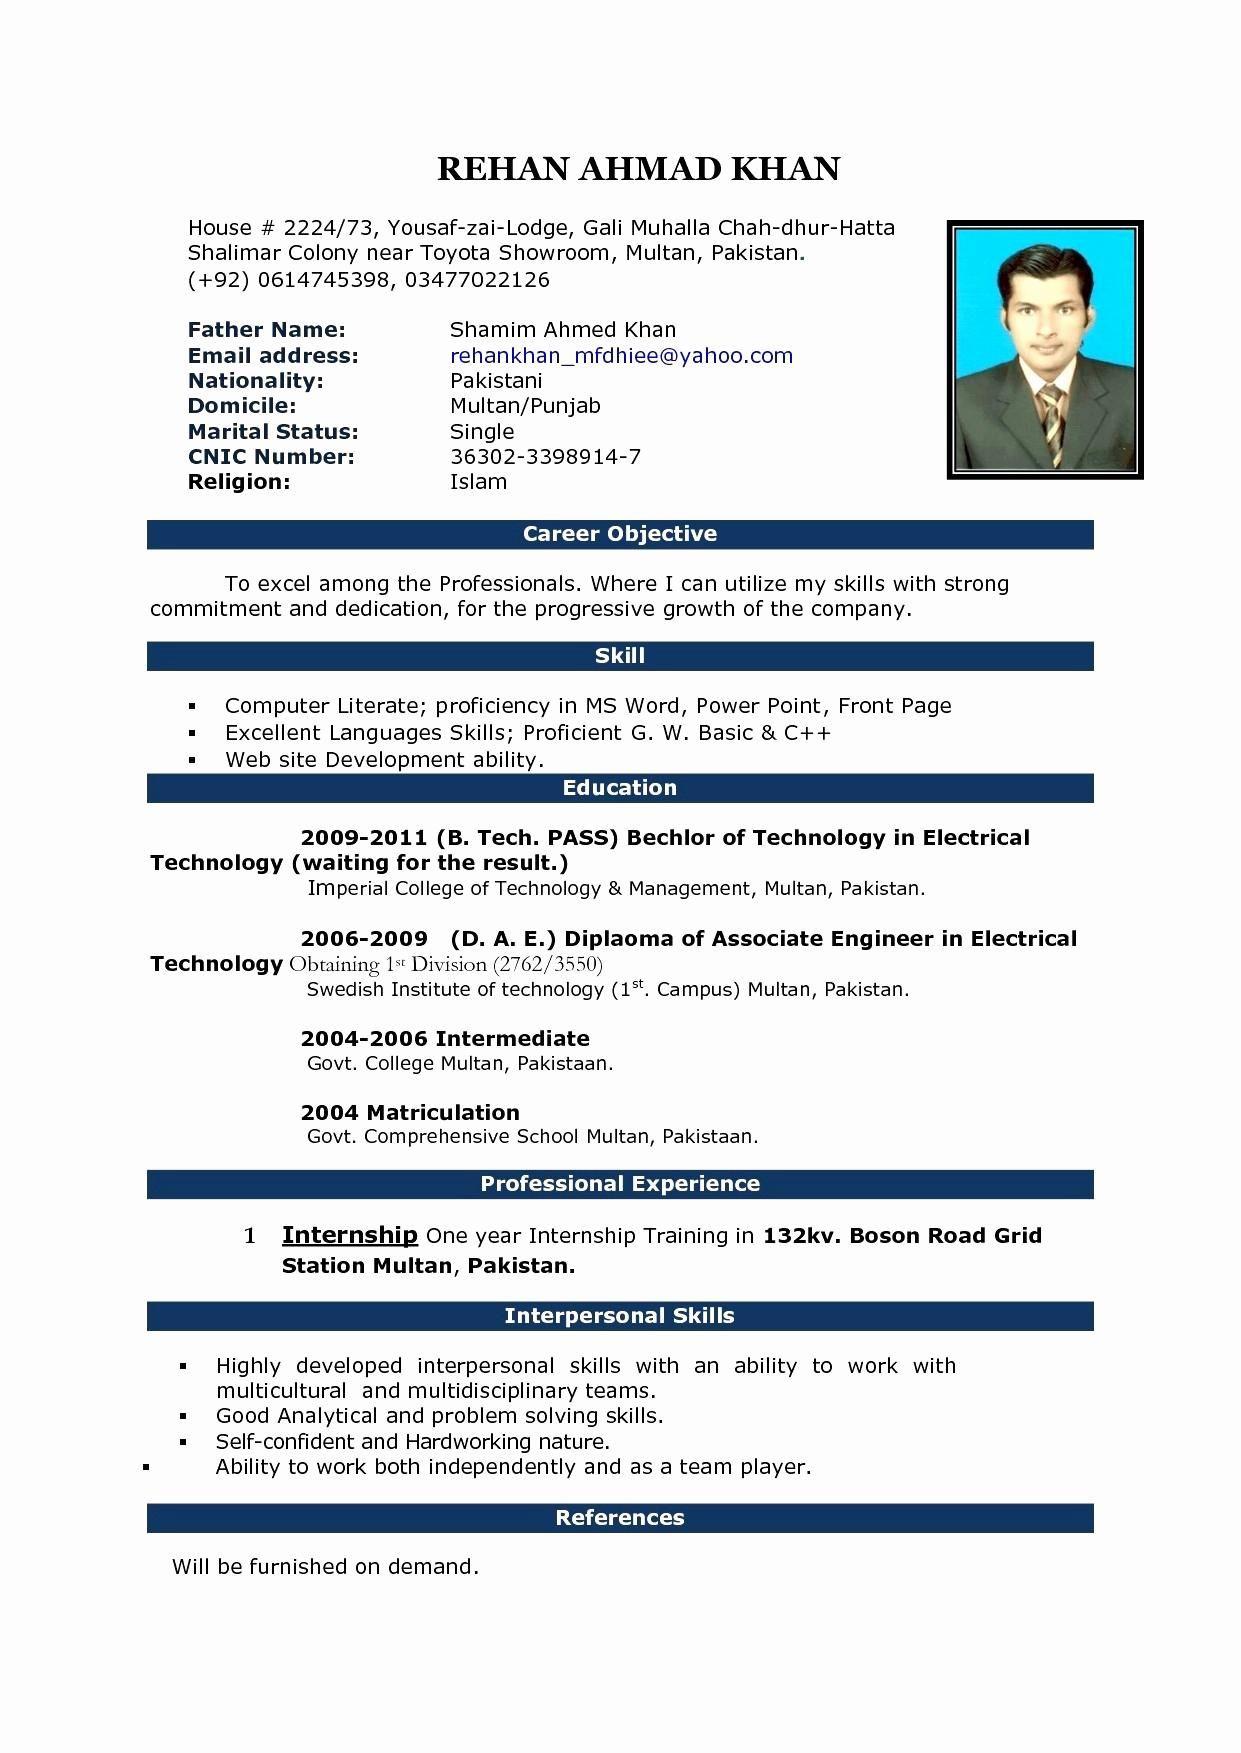 B Com Resume Templates Beautiful Images Web Designer Resume Word Format Inspirationa Cv Template Download Microsoft Word Resume Template Resume Format Download